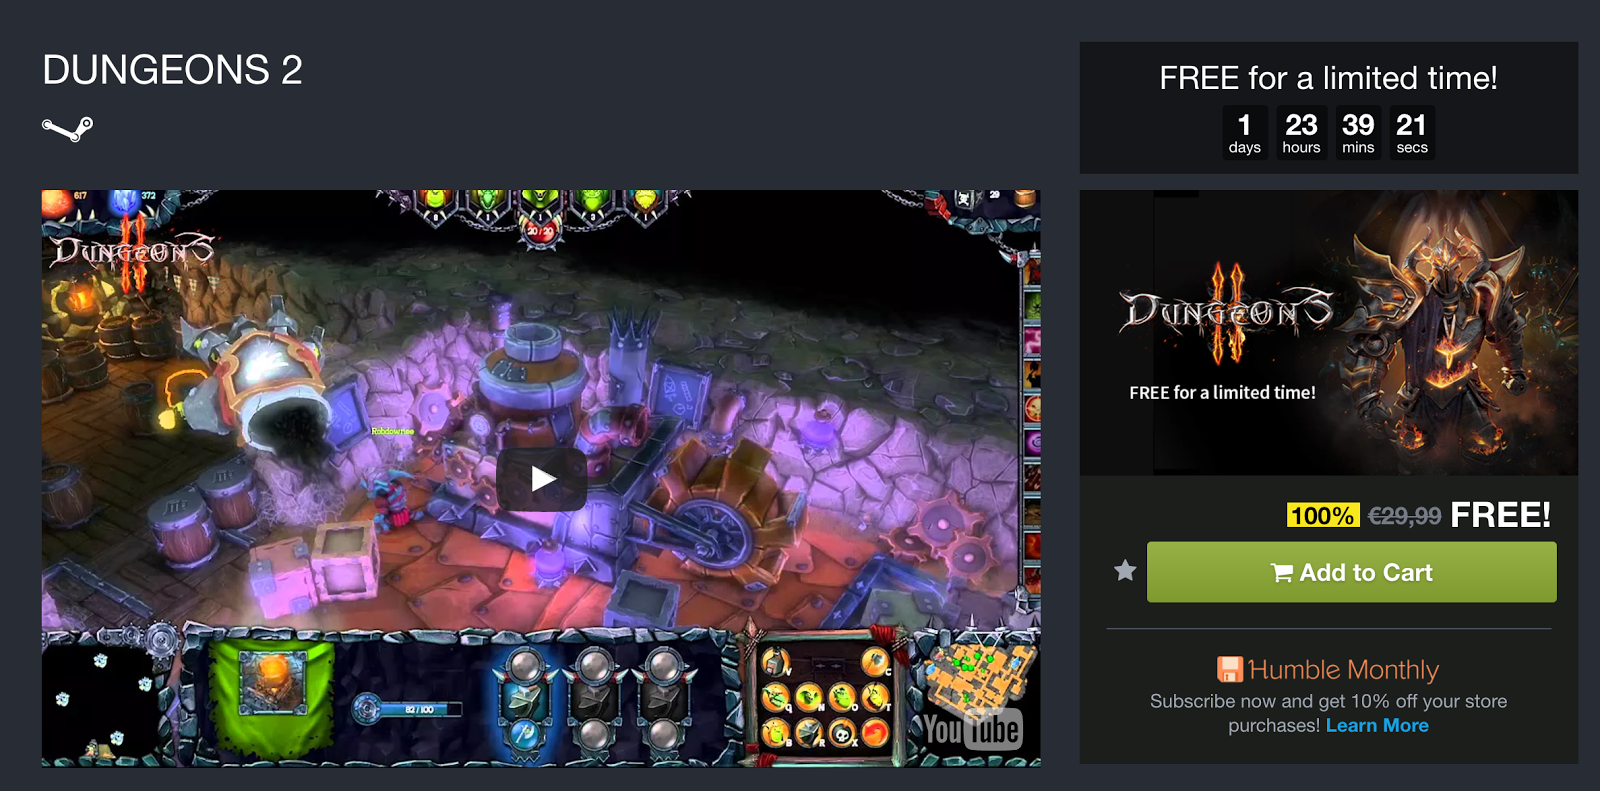 DUNGEONS II gratis para Steam